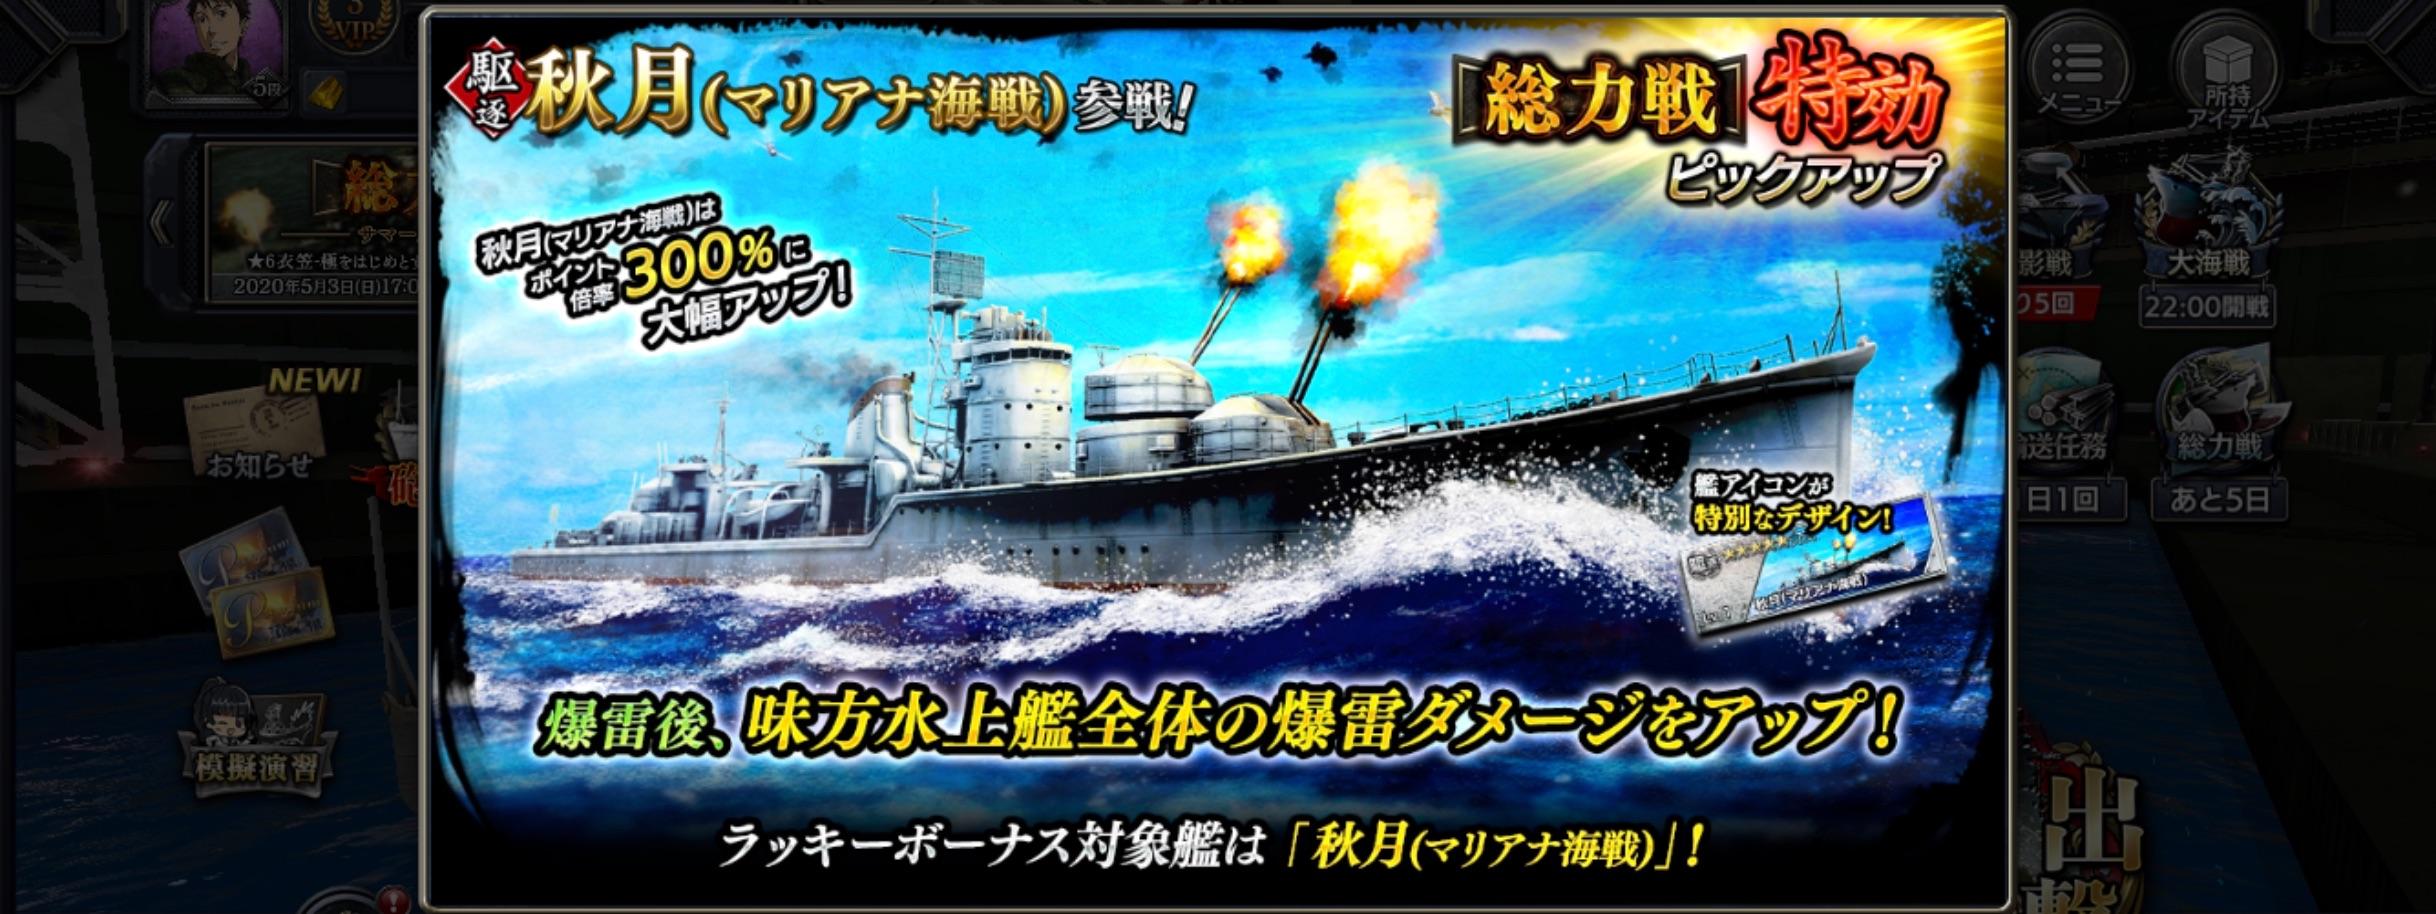 AkizukiM-salvage